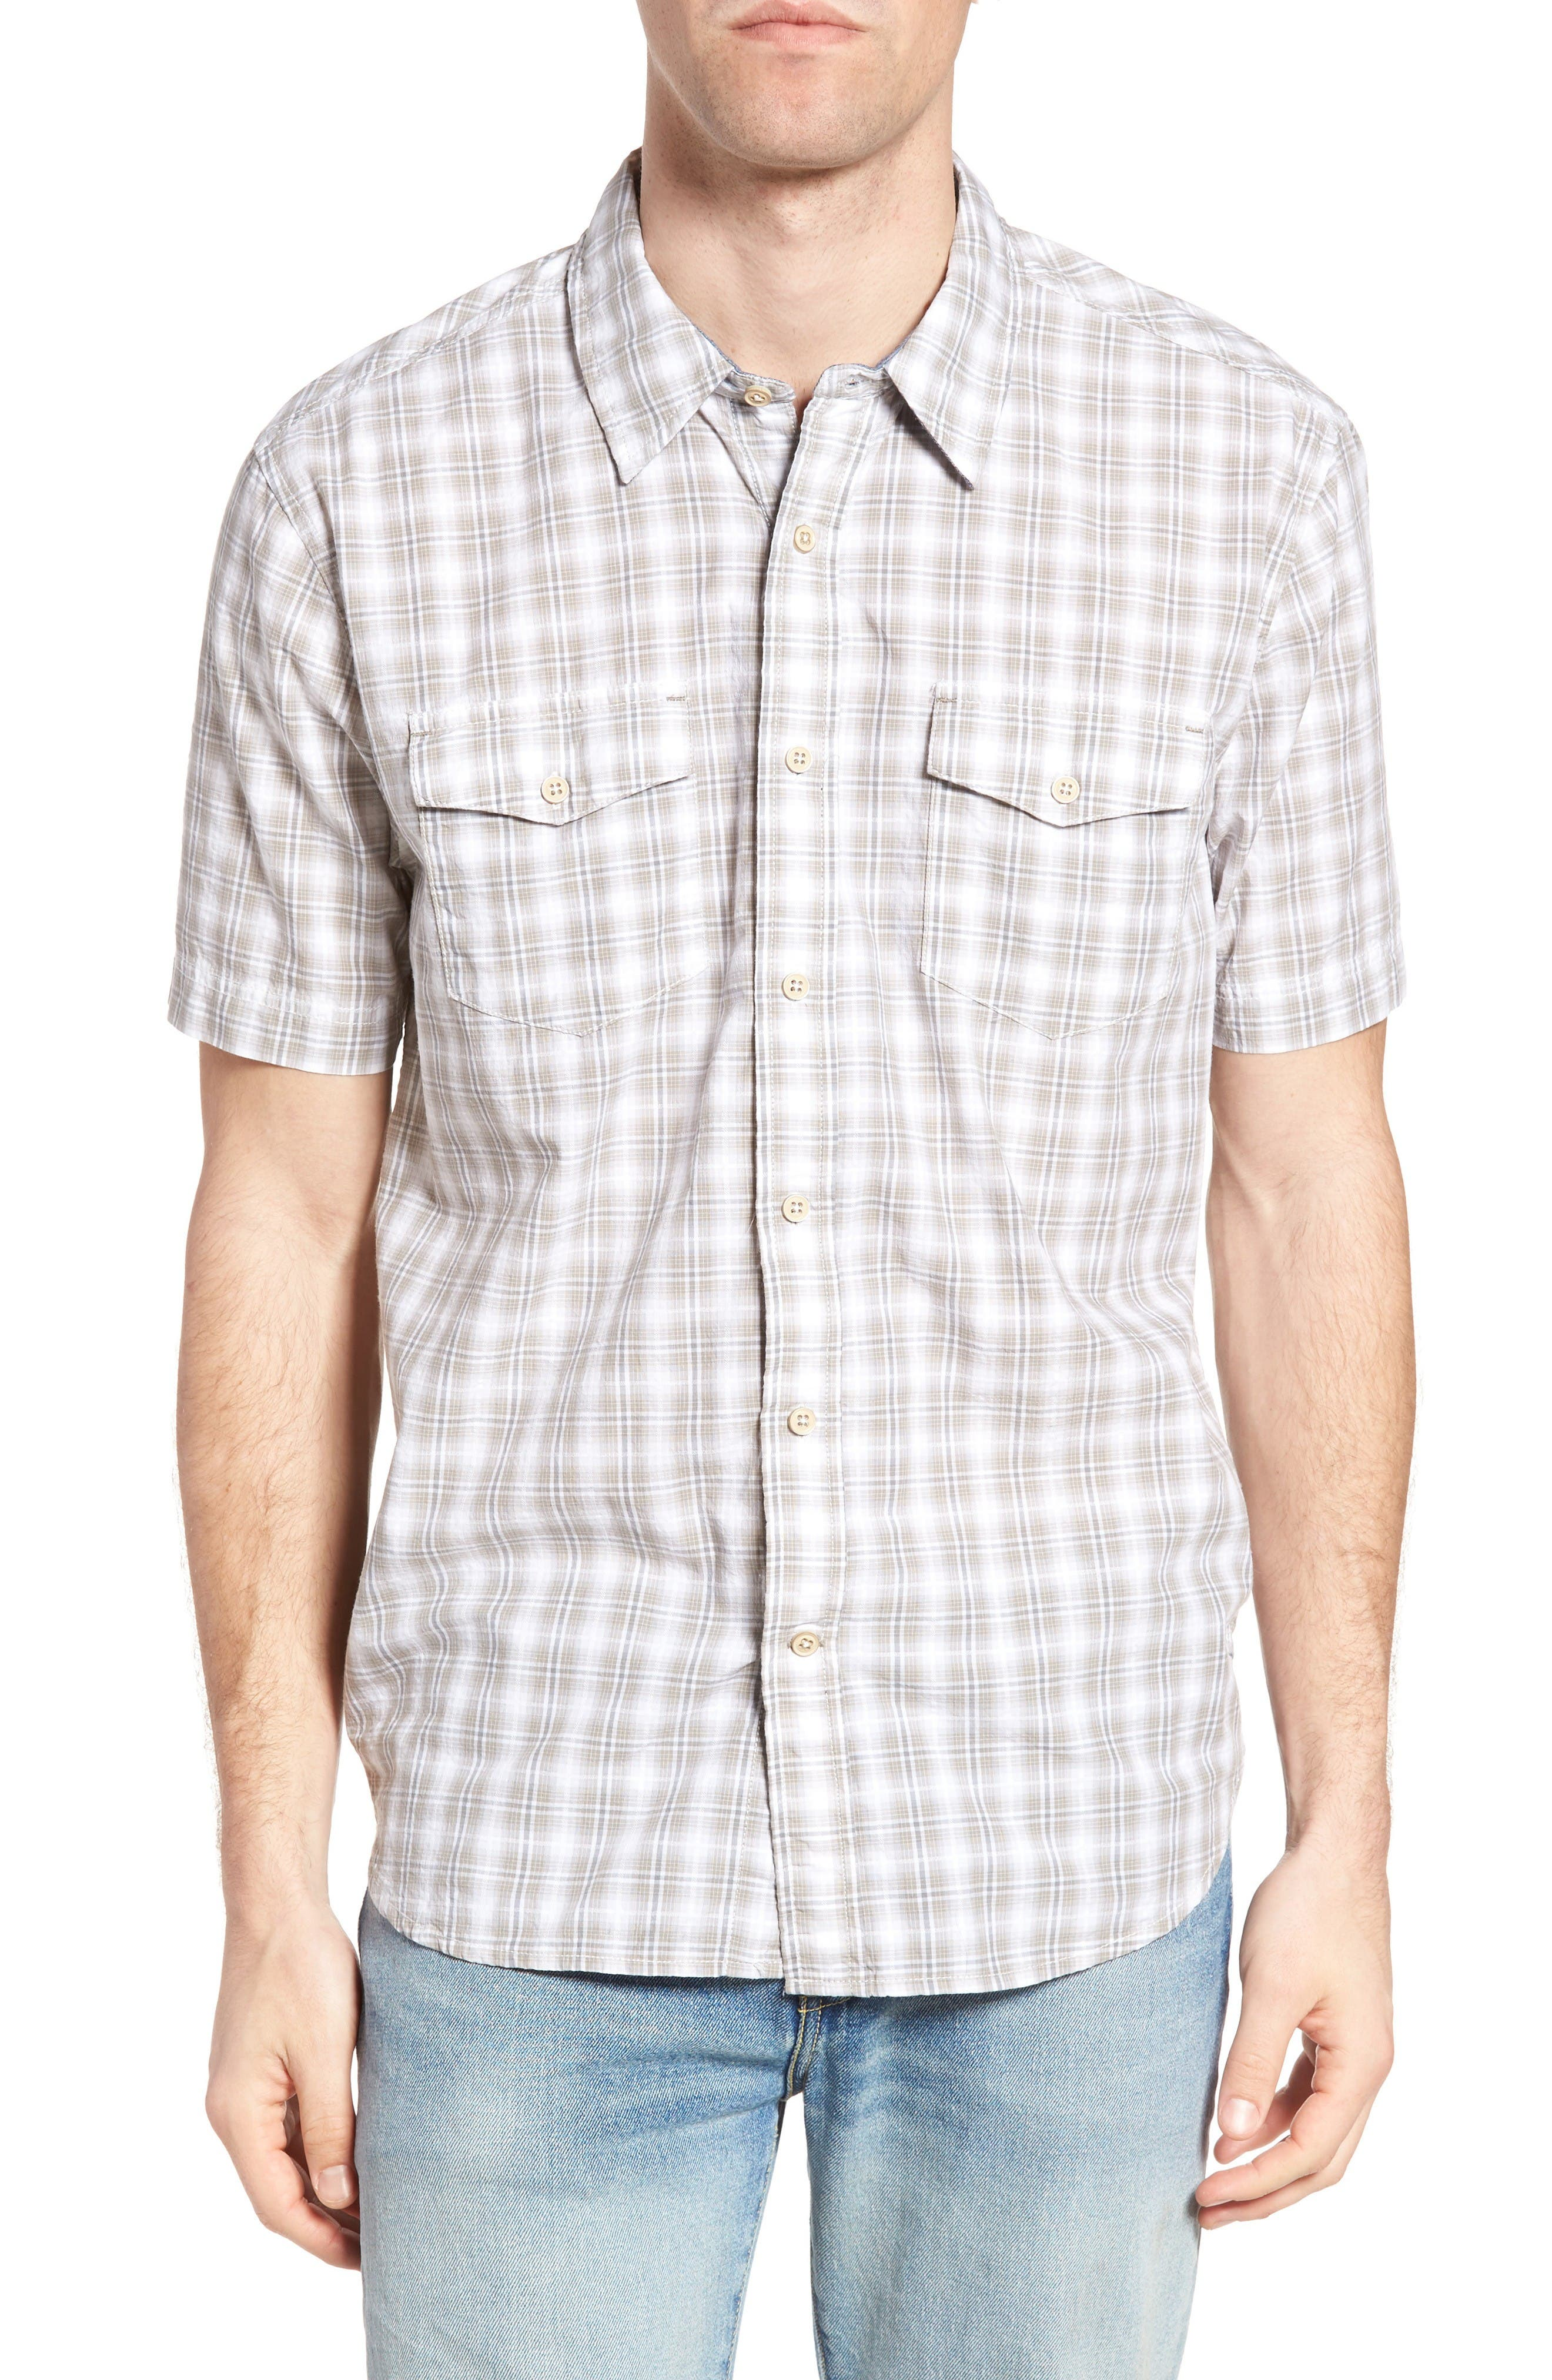 Alternate Image 1 Selected - True Grit Soho Plaid Cotton Sport Shirt